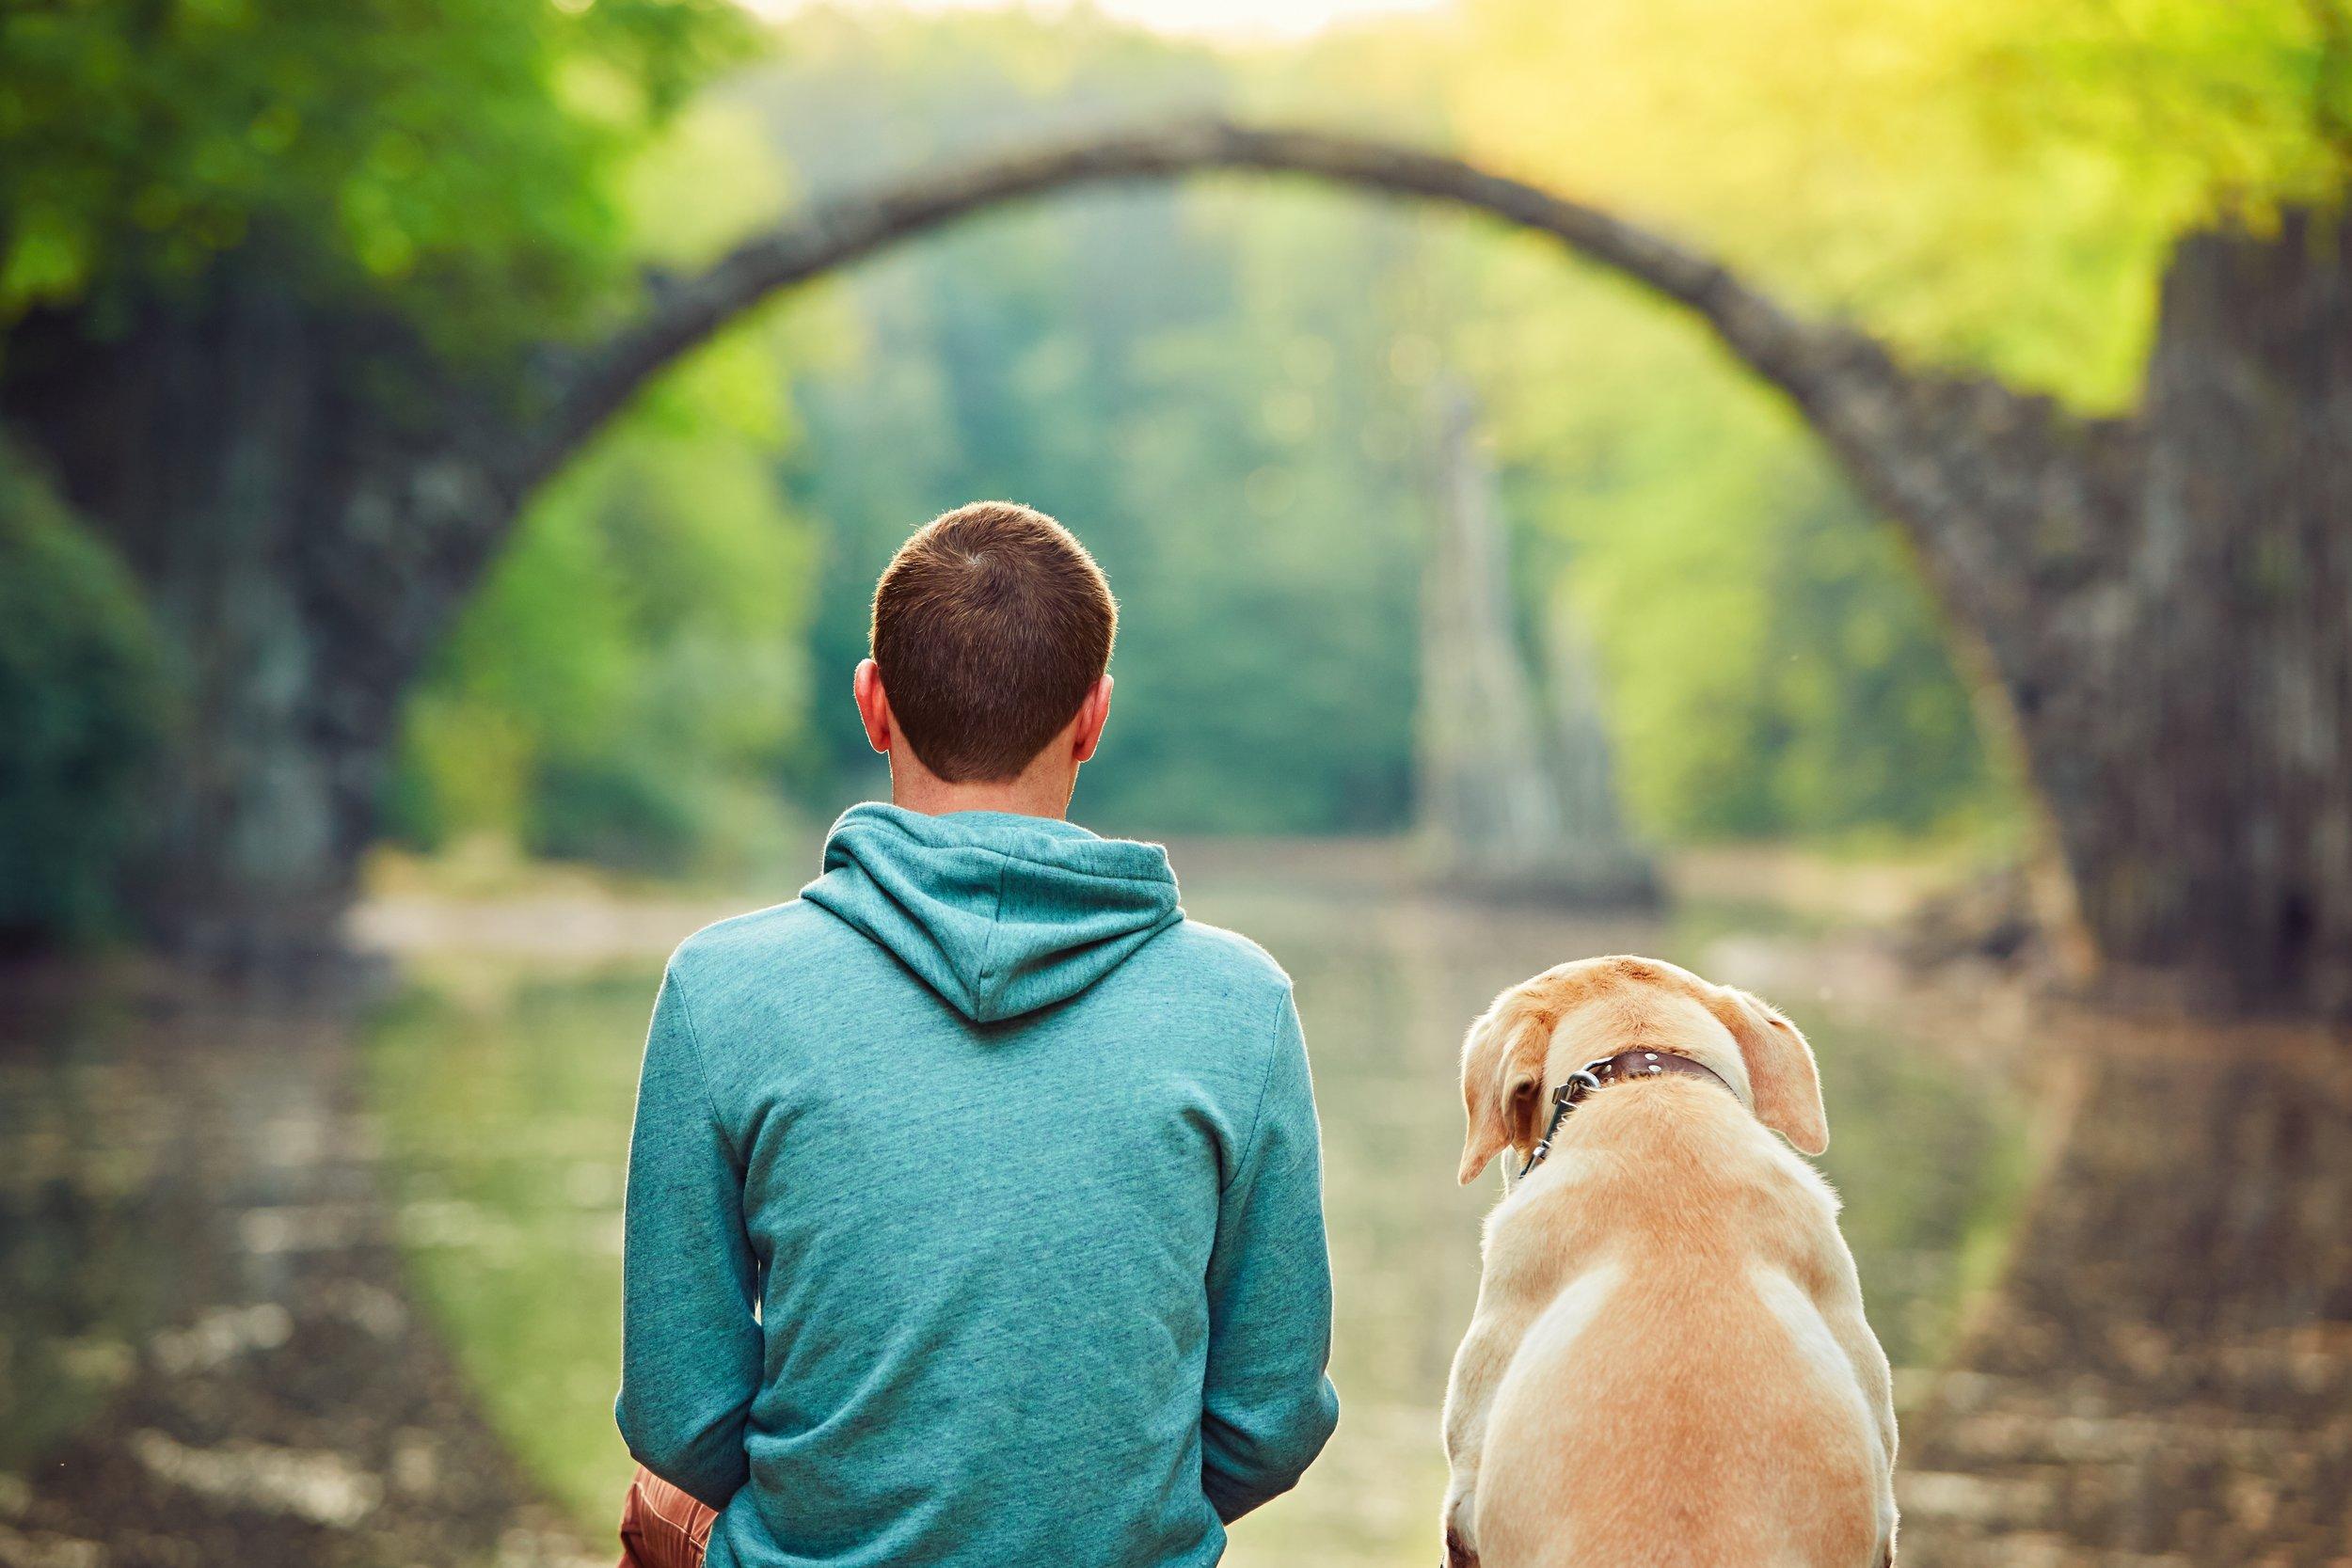 pensive-man-sitting-with-his-dog-PDGWBJ5.jpg